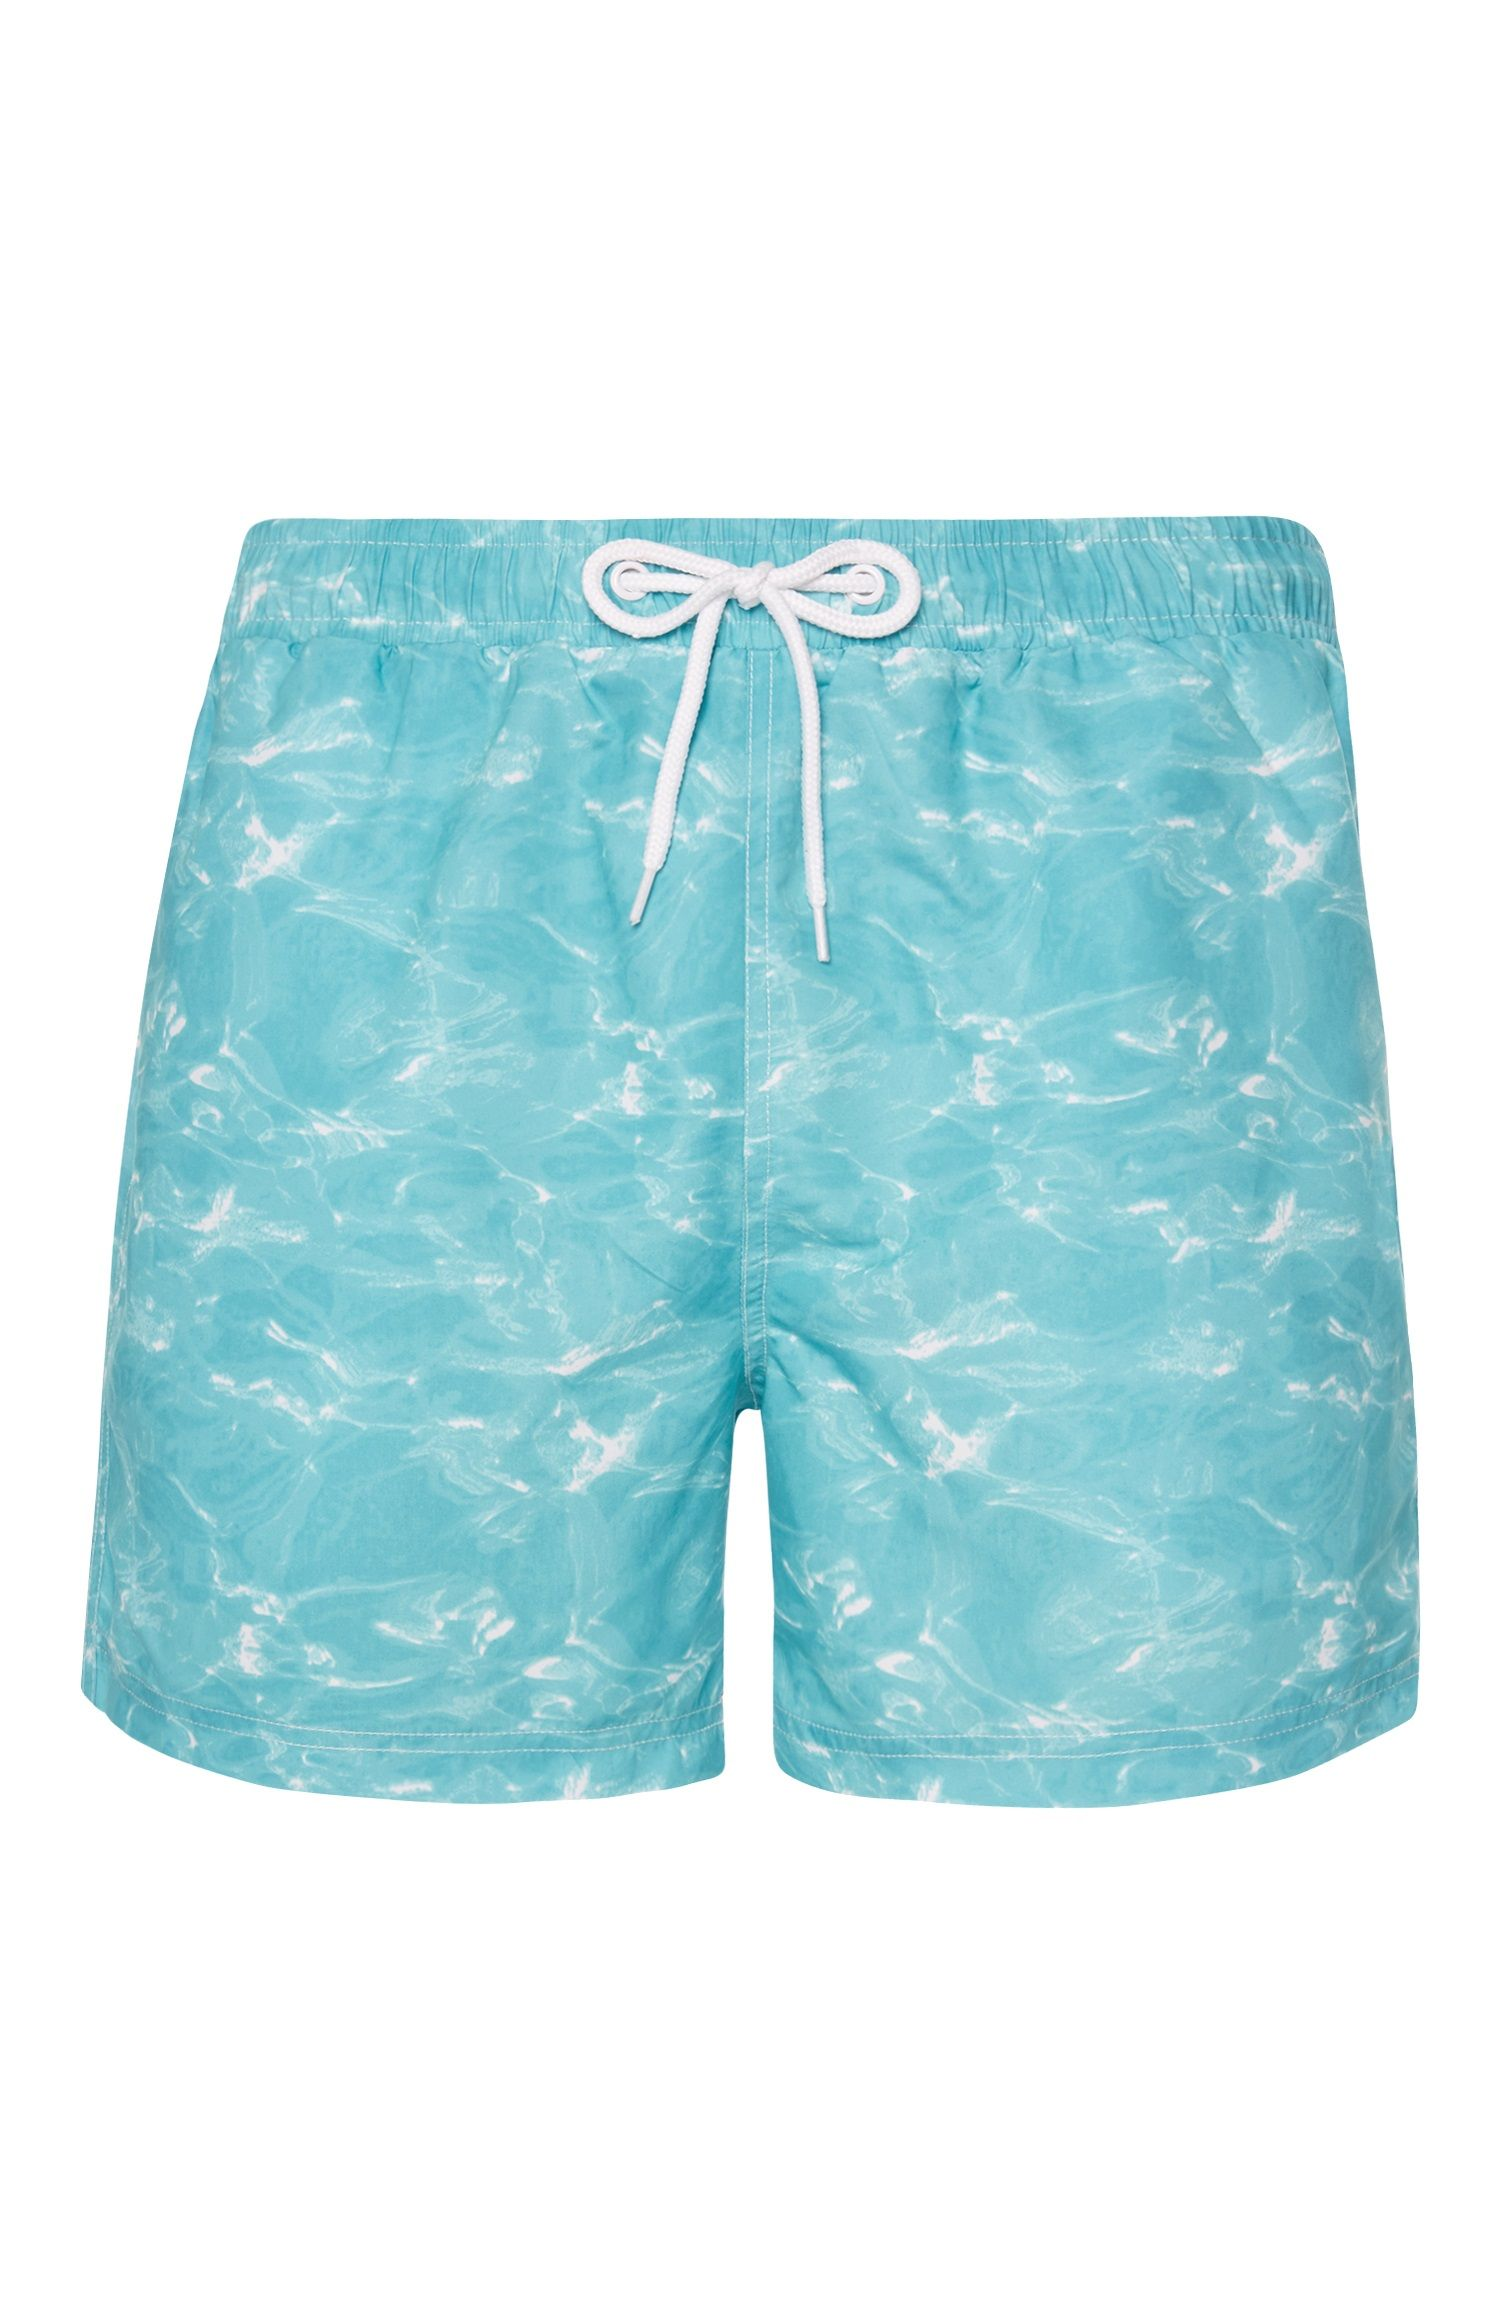 b18c93f116 Primark - Water Print Swim Shorts | SS17 Men